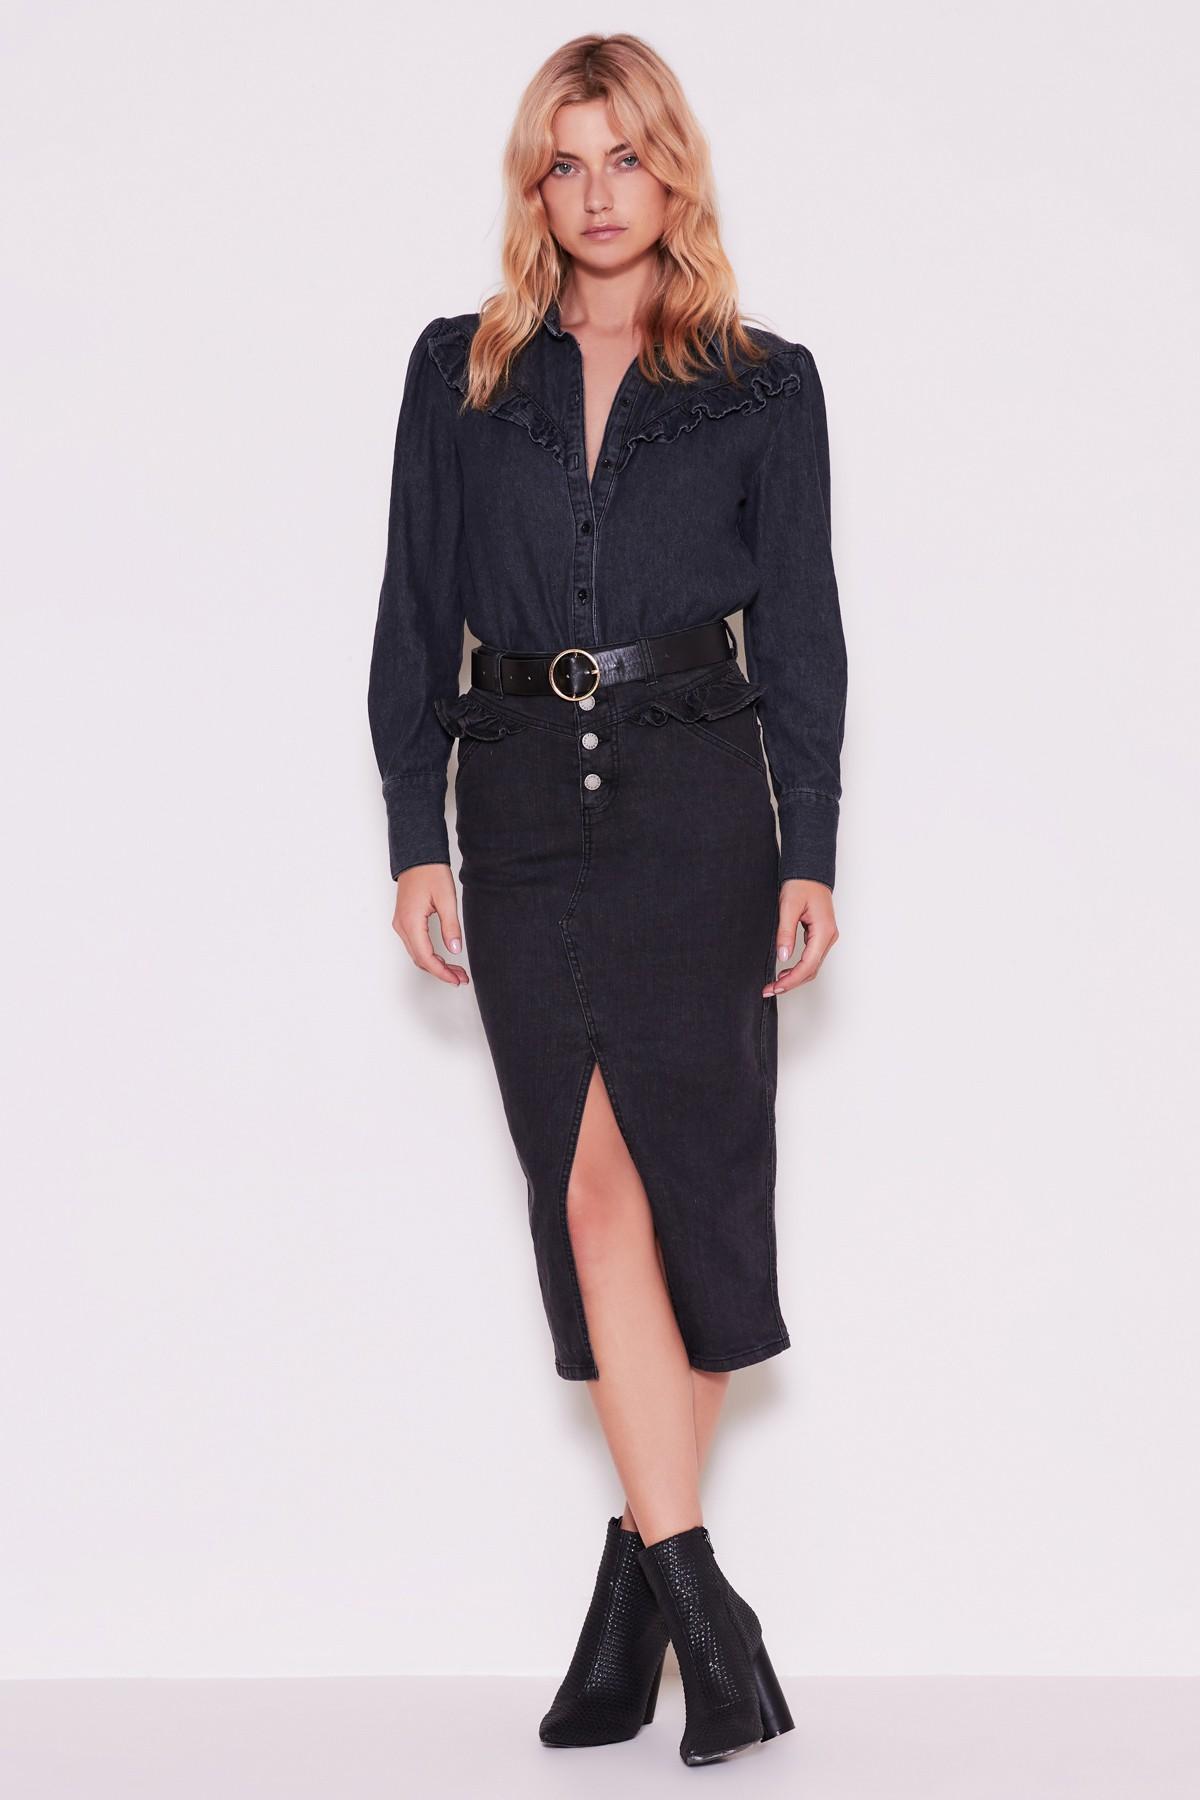 https://us.fashionbunker.com/subject-skirt-washed-black